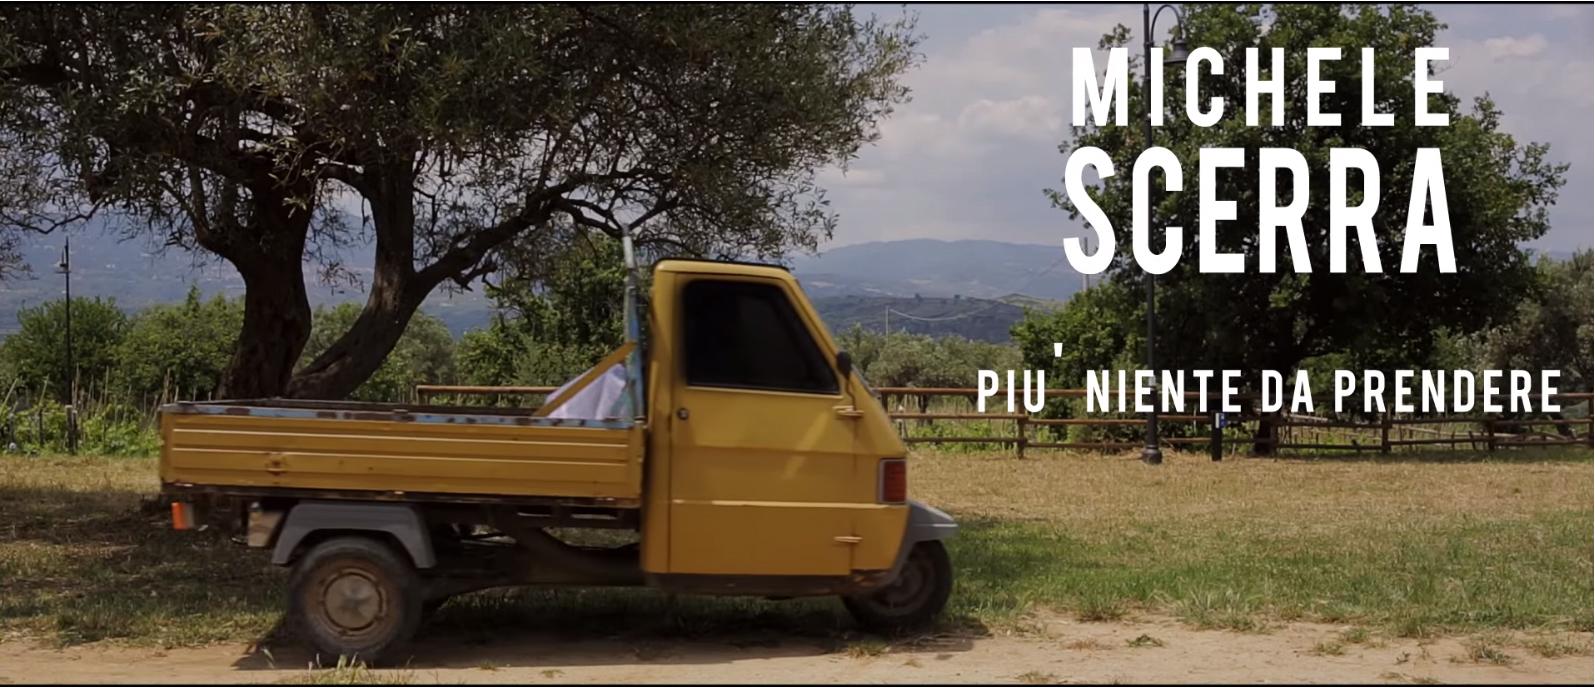 Michele Scerra – Più niente da prendere